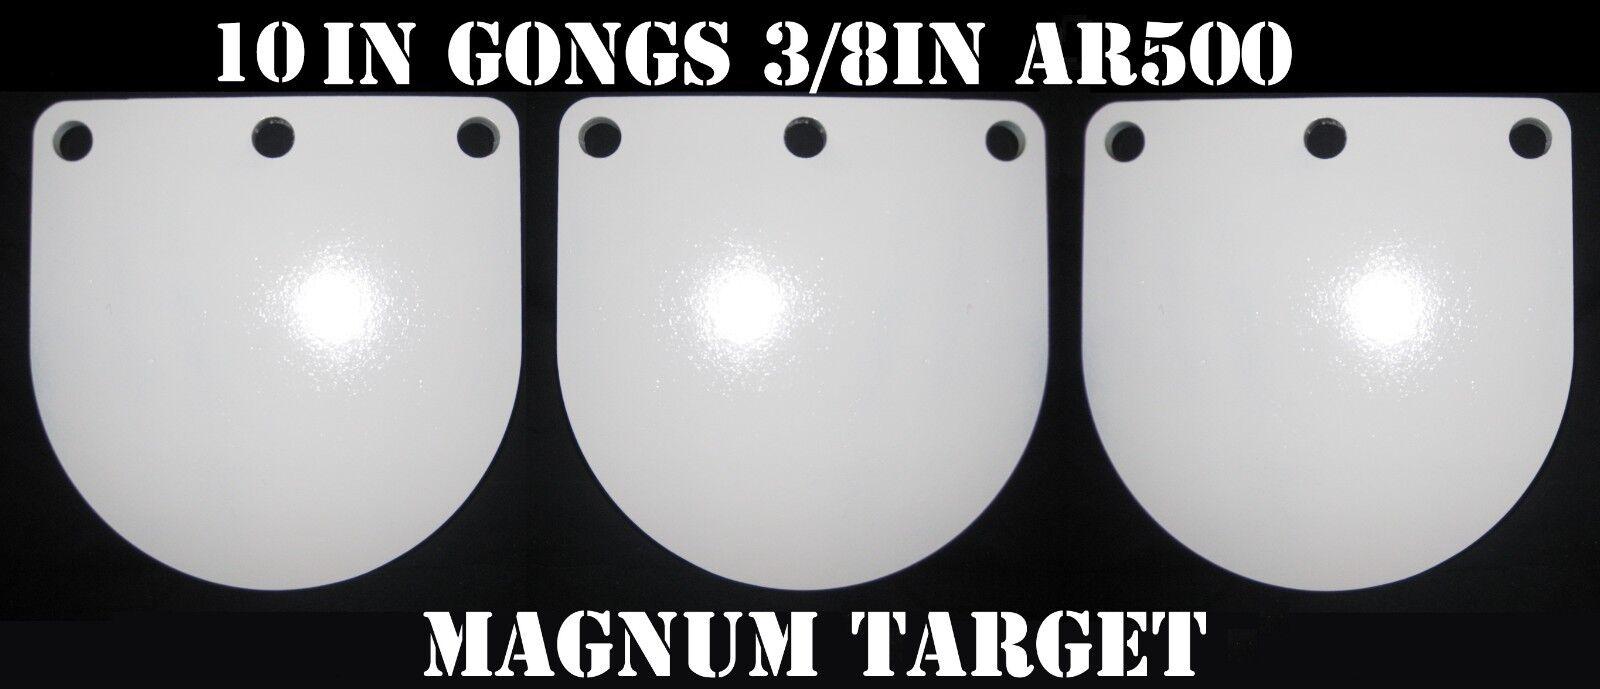 Objetivo de disparo Gong 10 in (approx. 25.40 cm) AR500 - 3 8 THK Metal Target - 3pc conjunto de destino de acero.